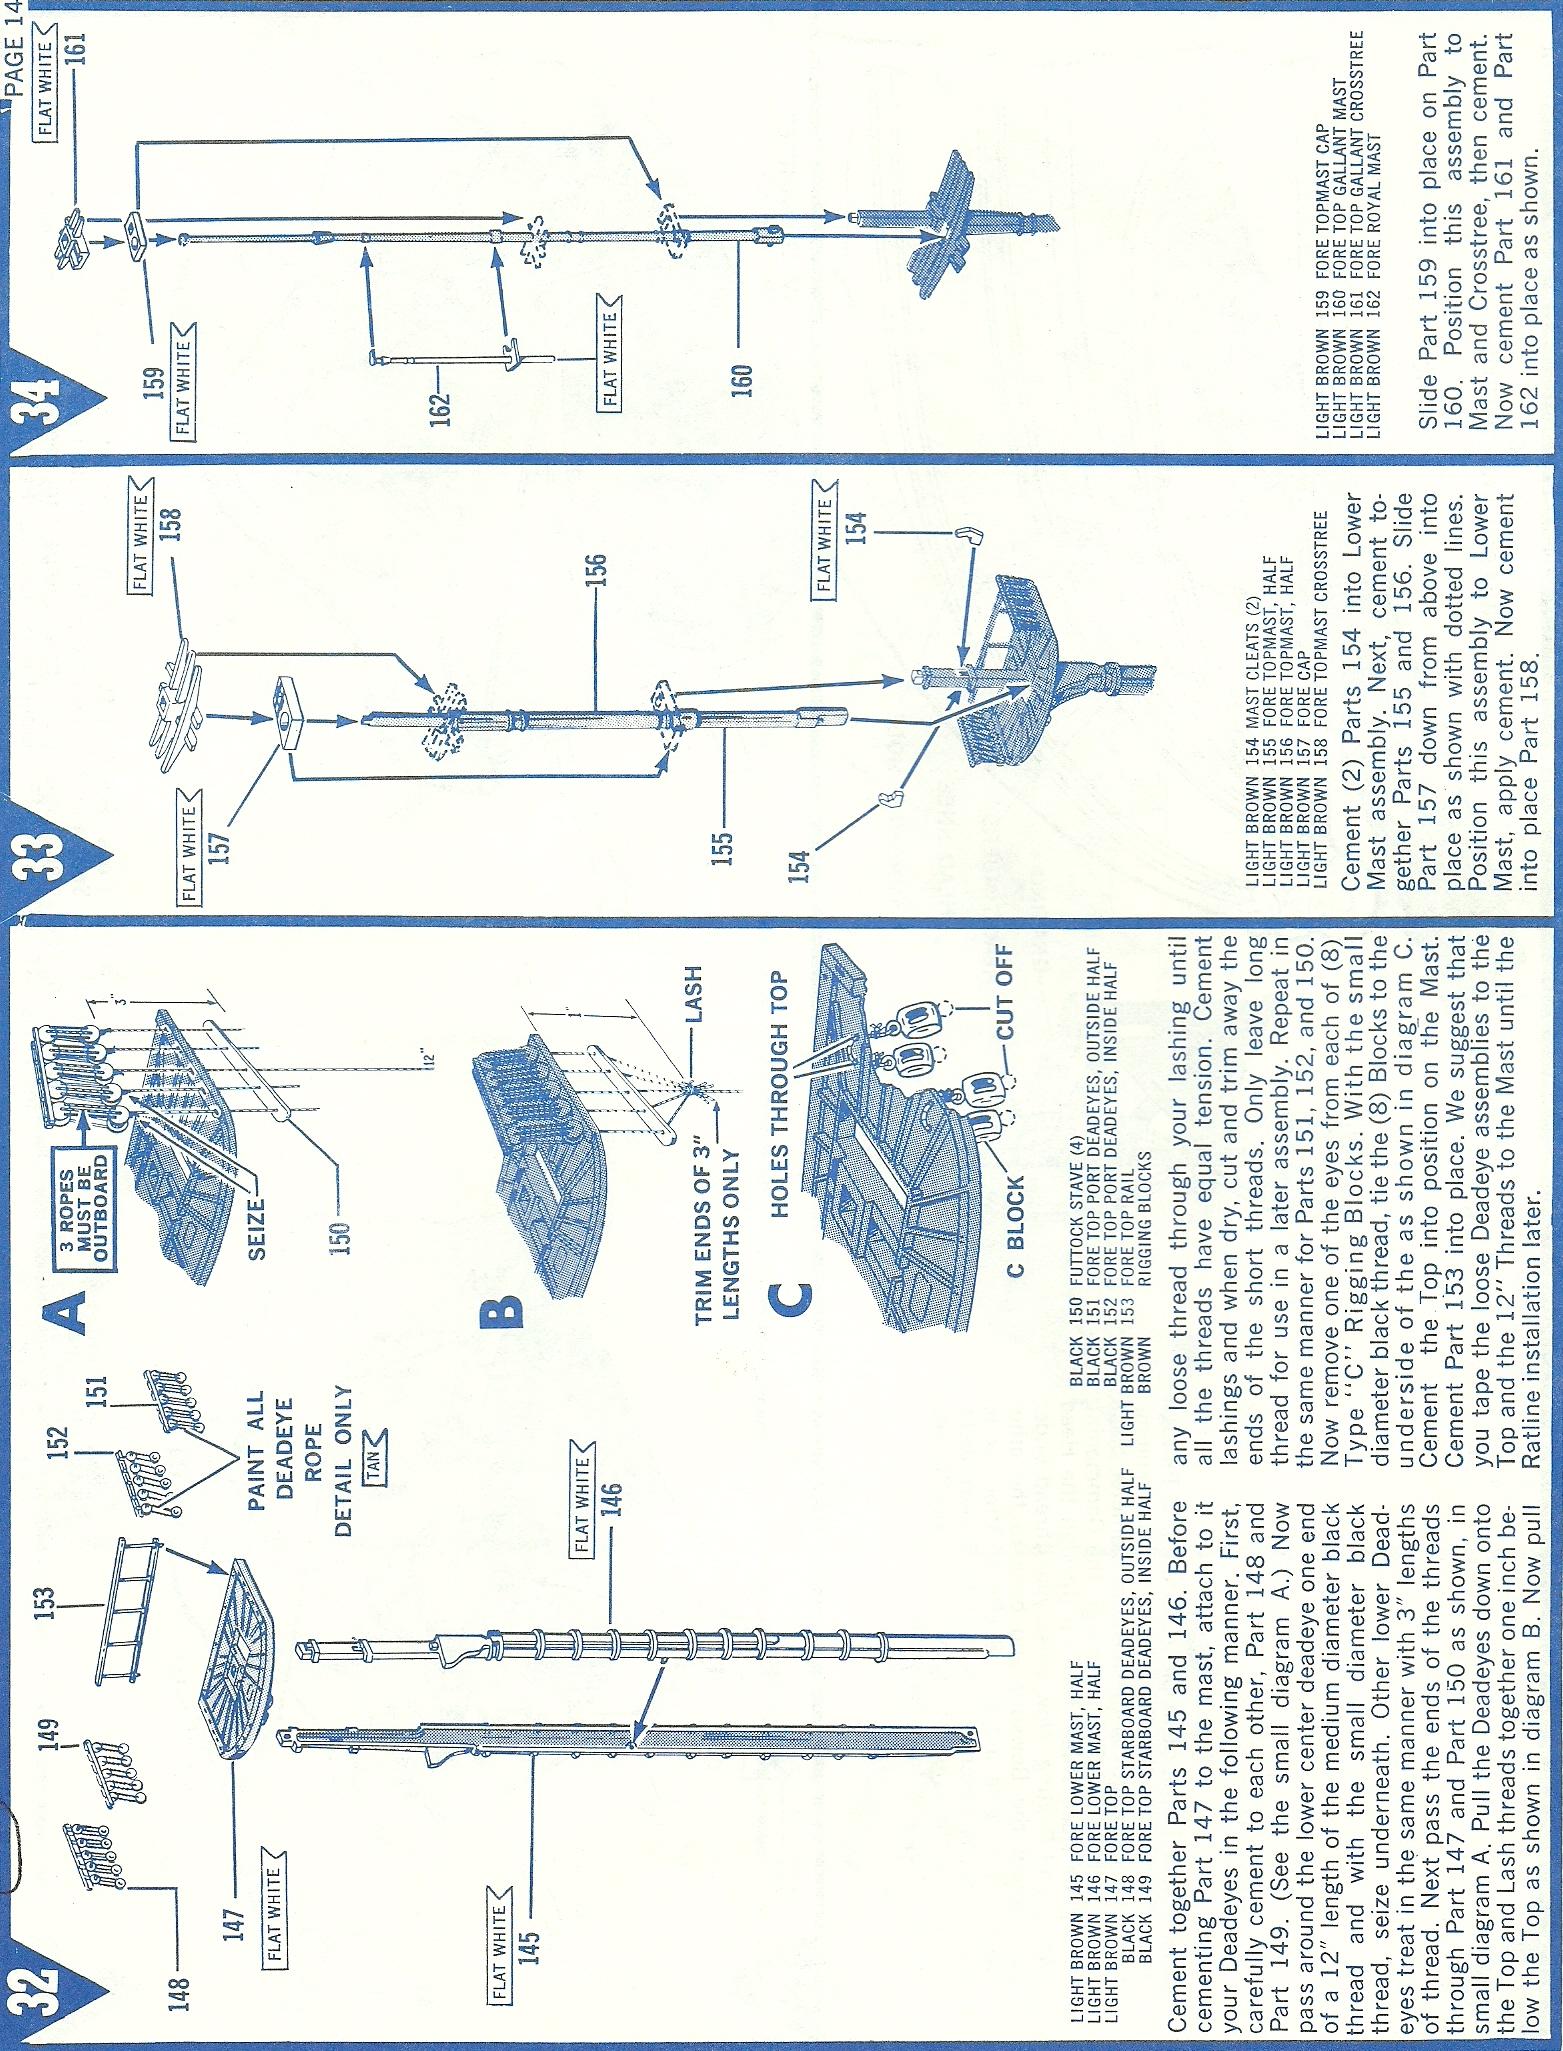 Bosch egg boiler instructions